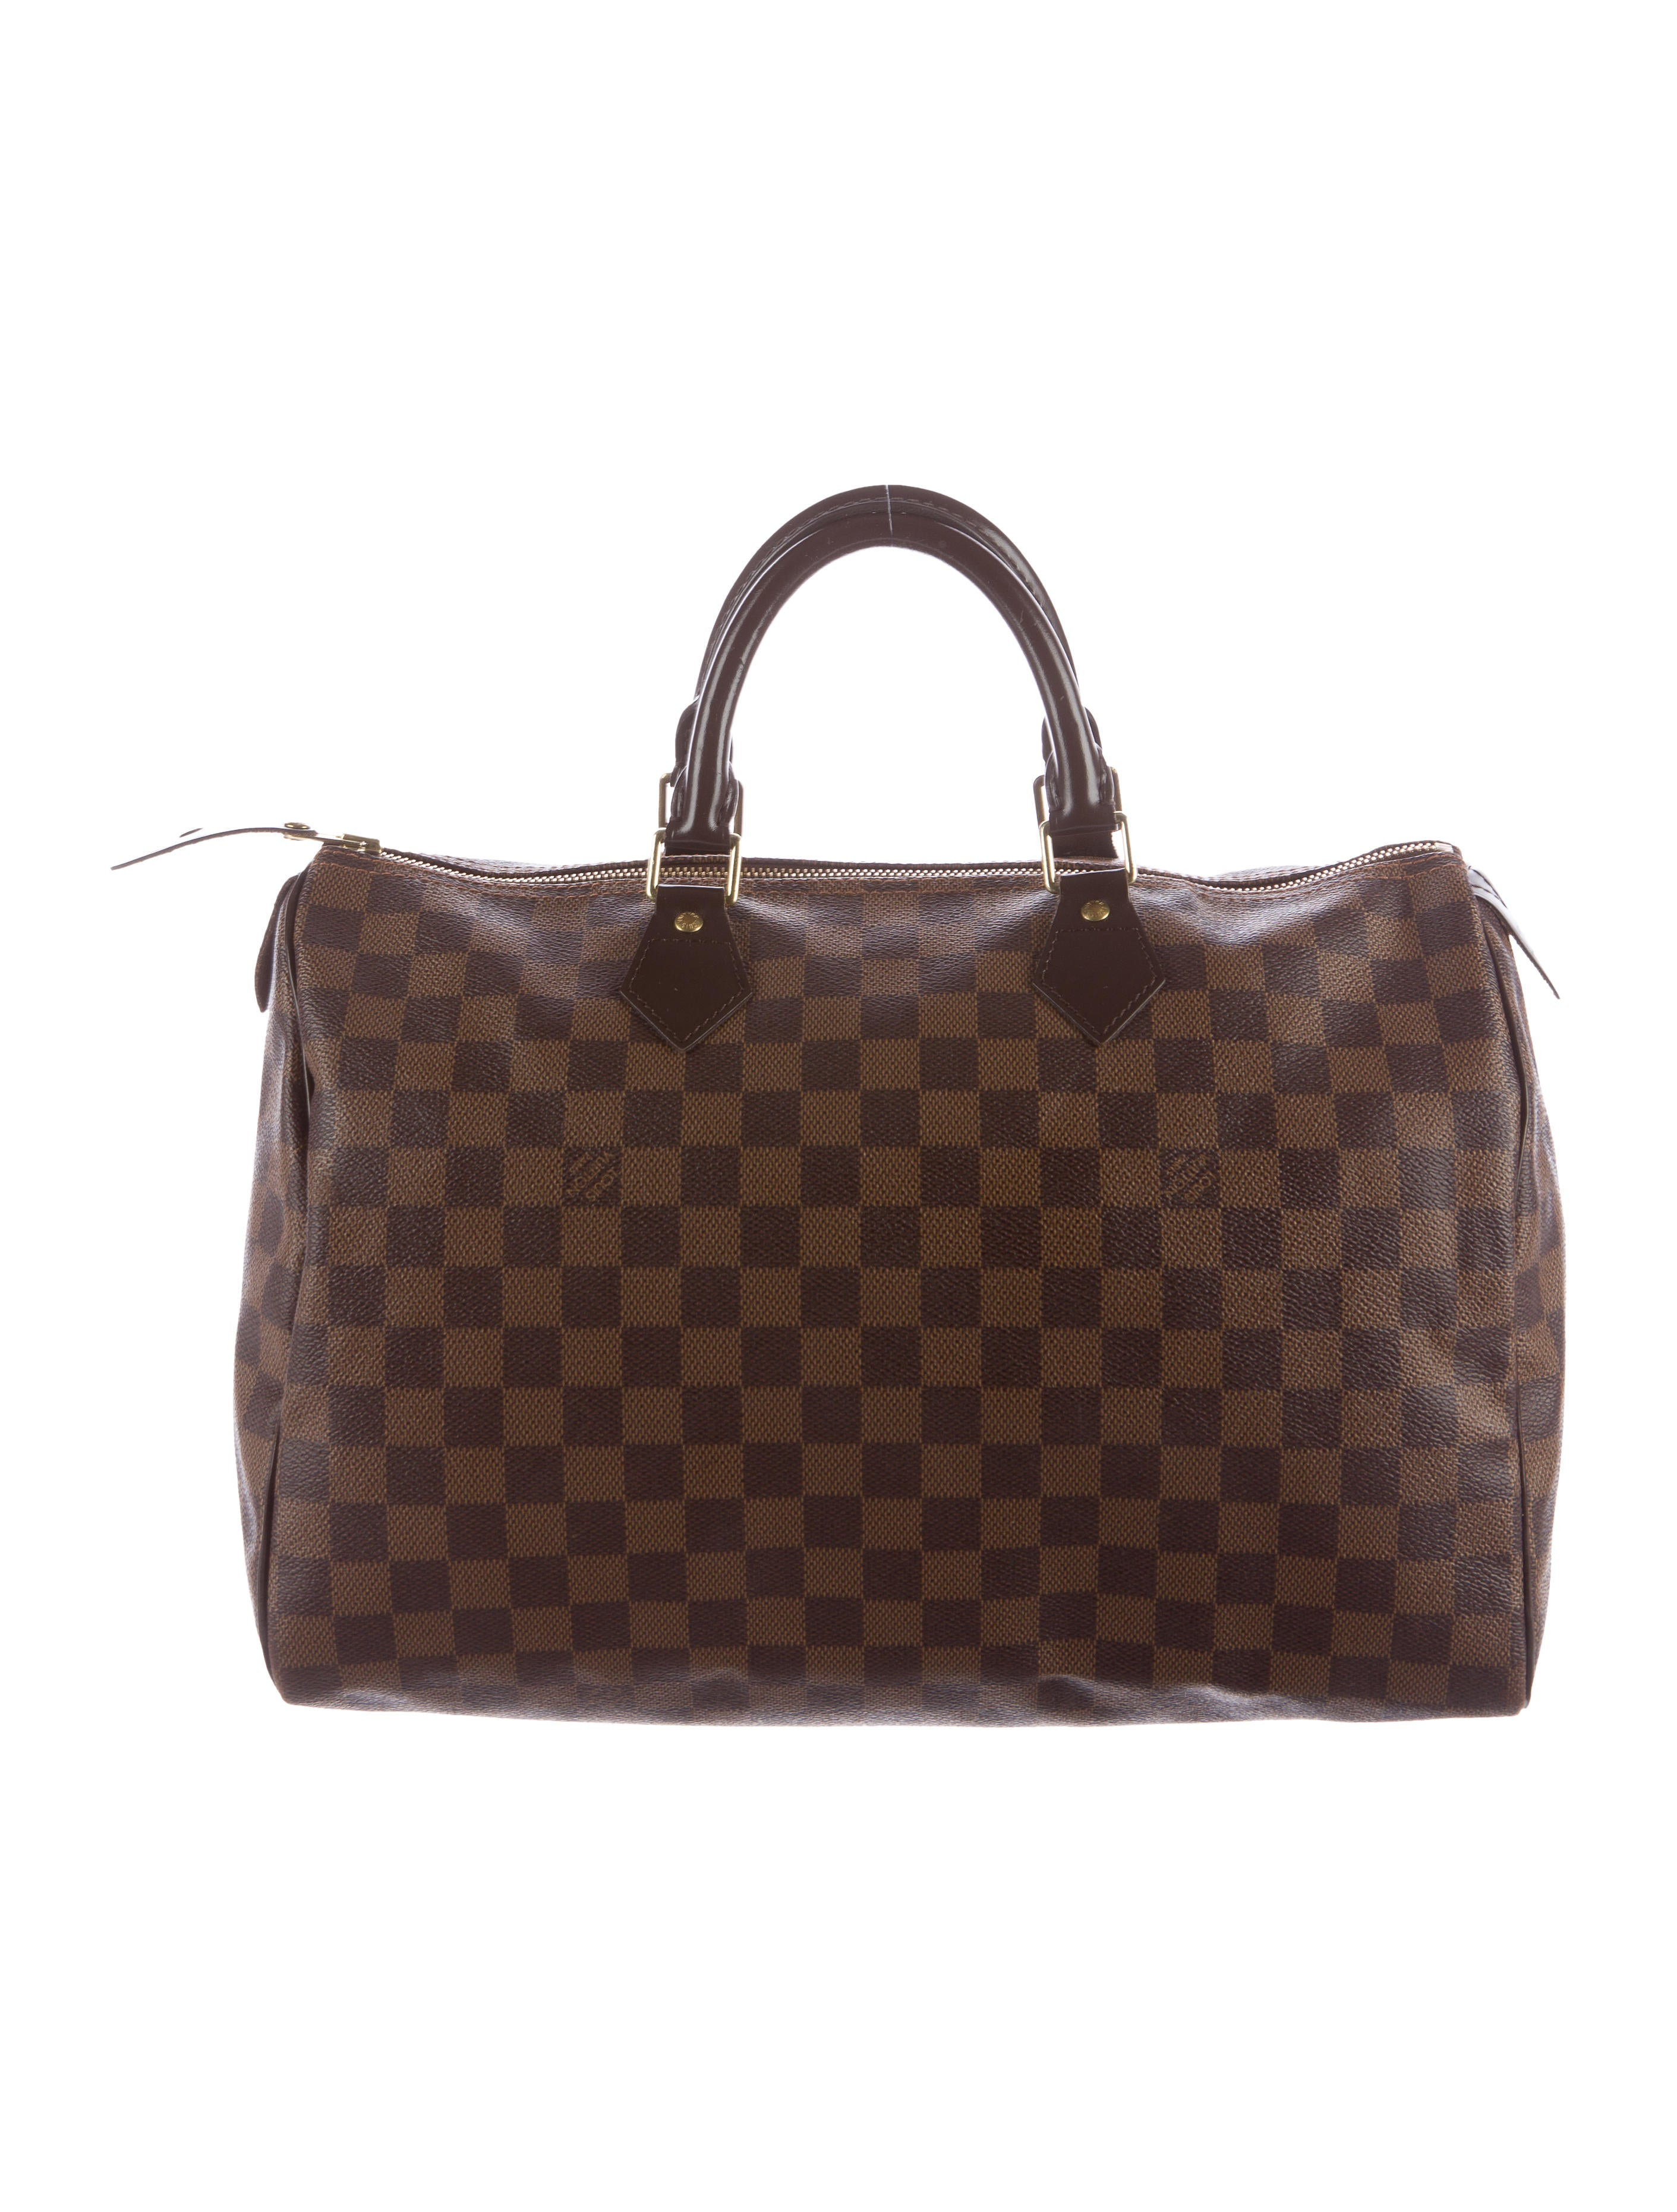 Louis vuitton damier ebene speedy 35 handbags for Louis vuitton miroir speedy 35